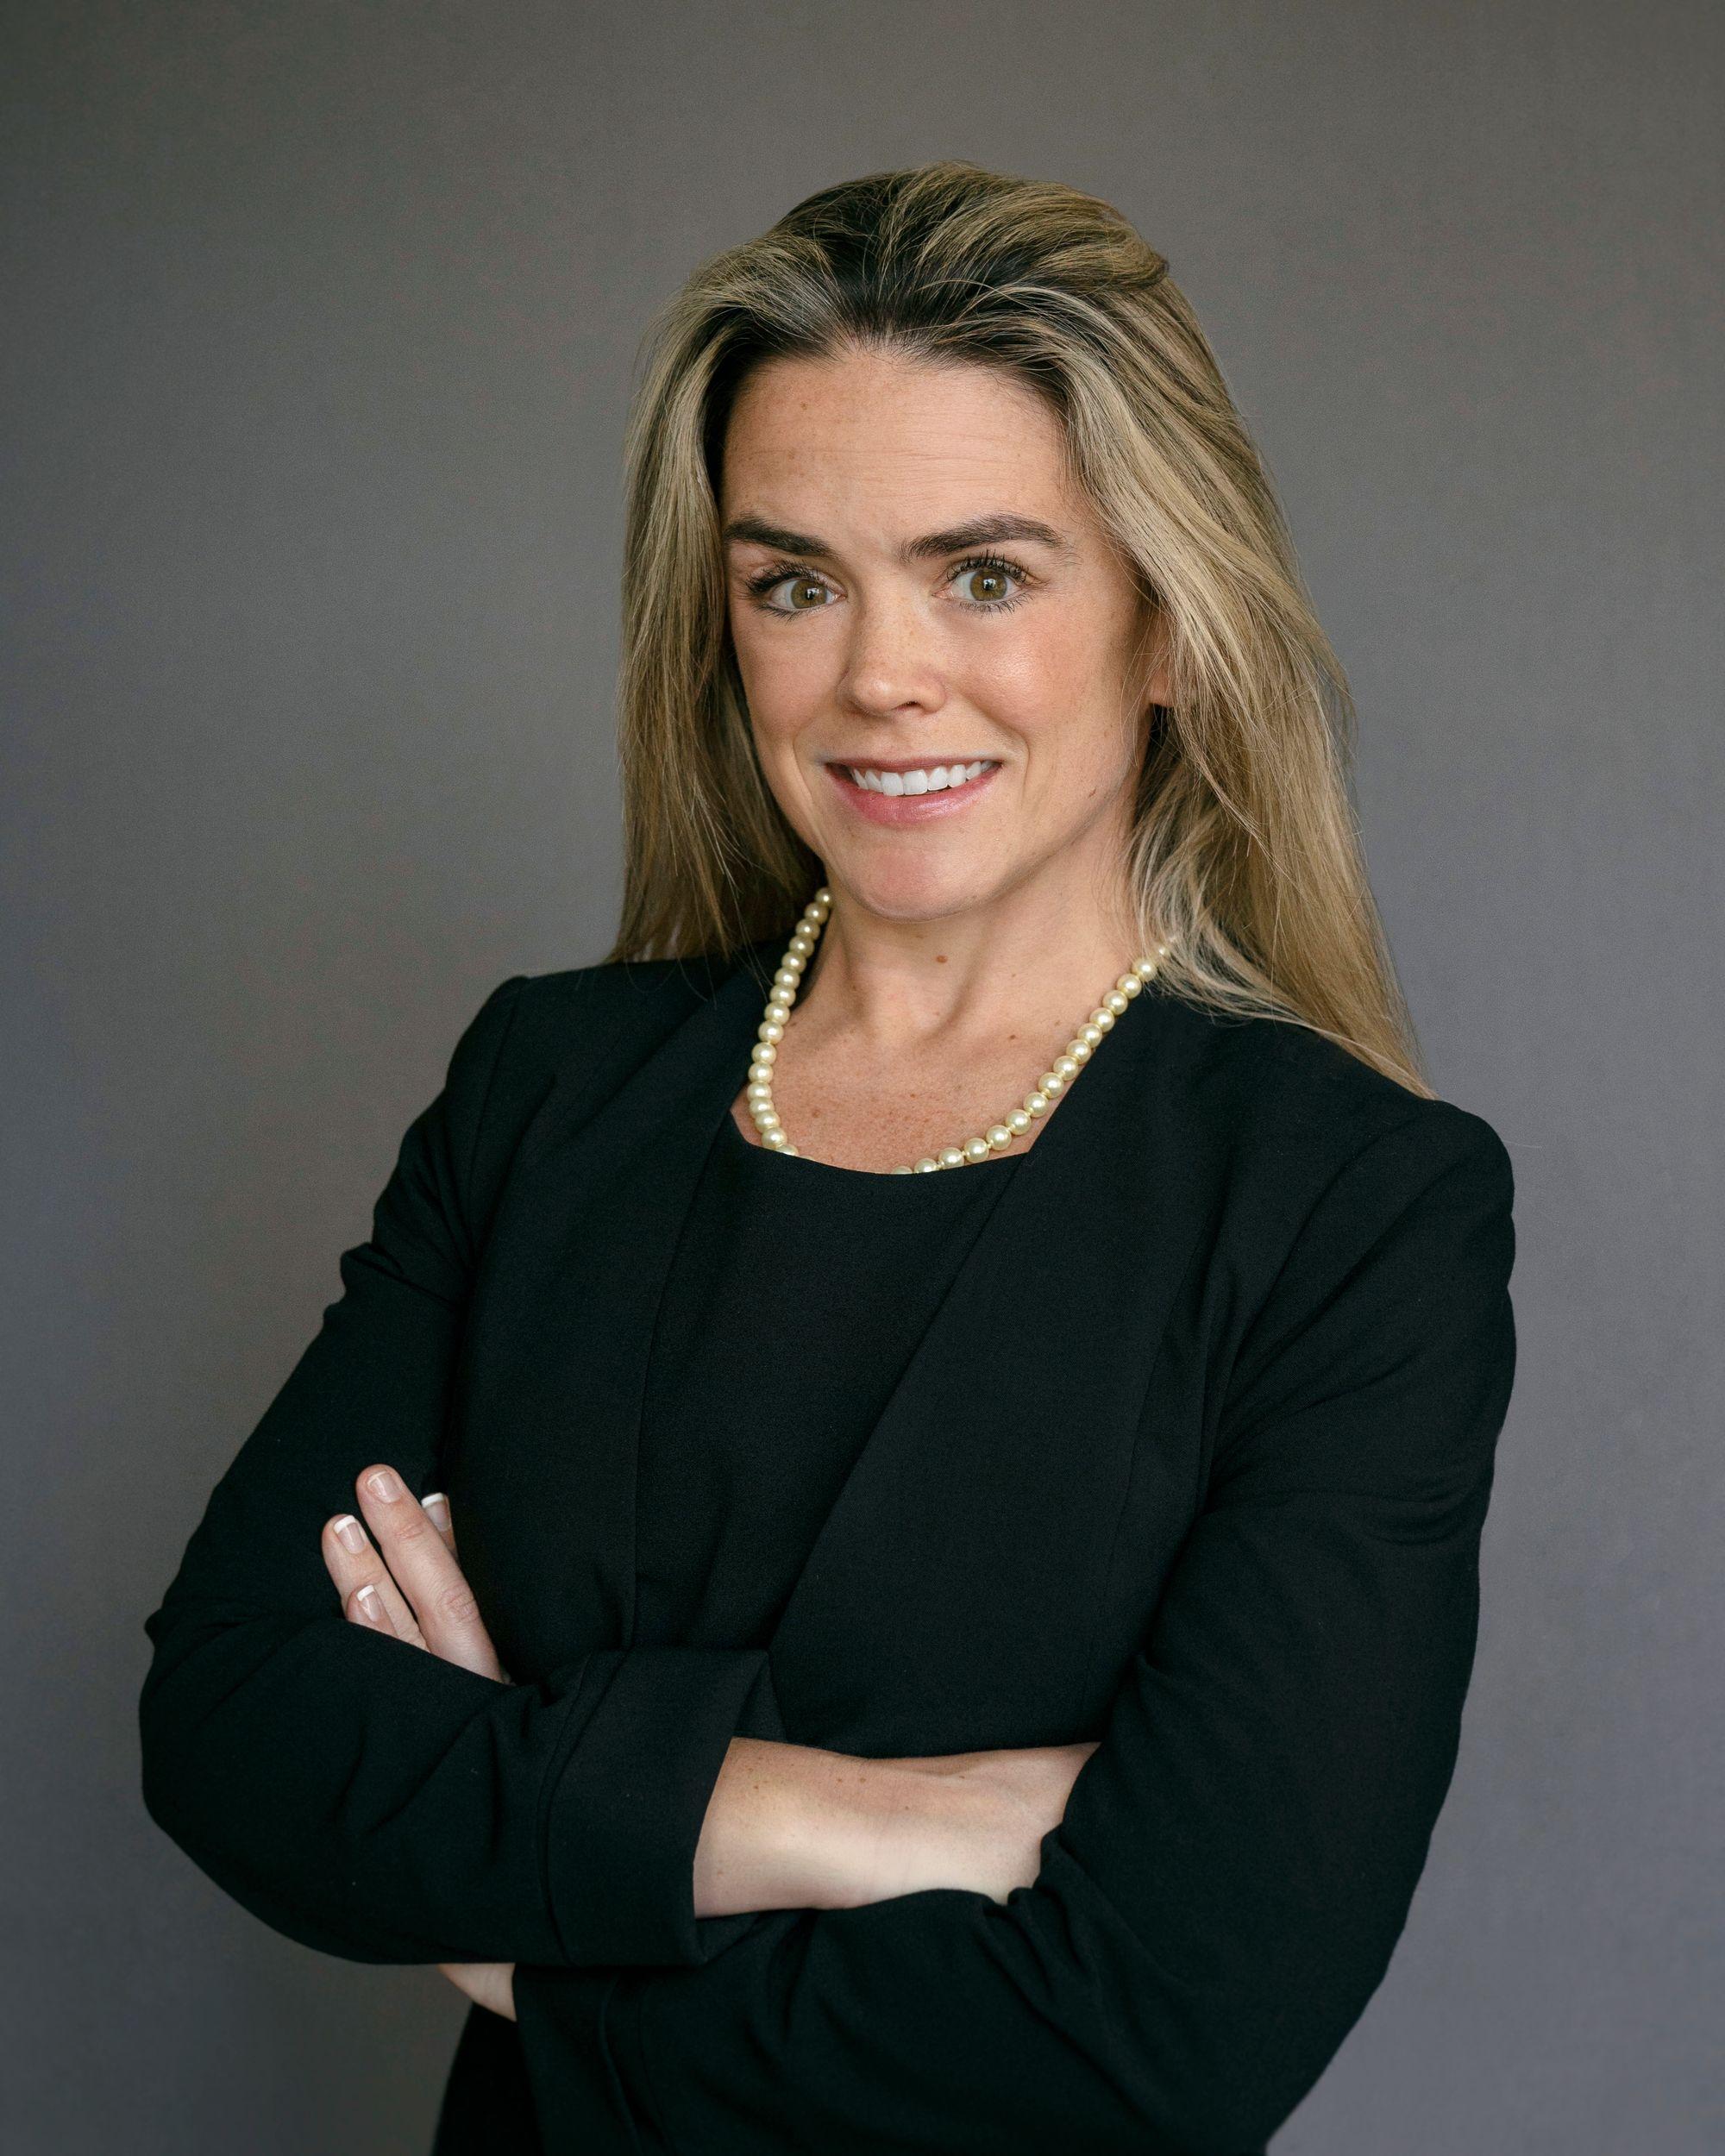 Tara N. Tighe